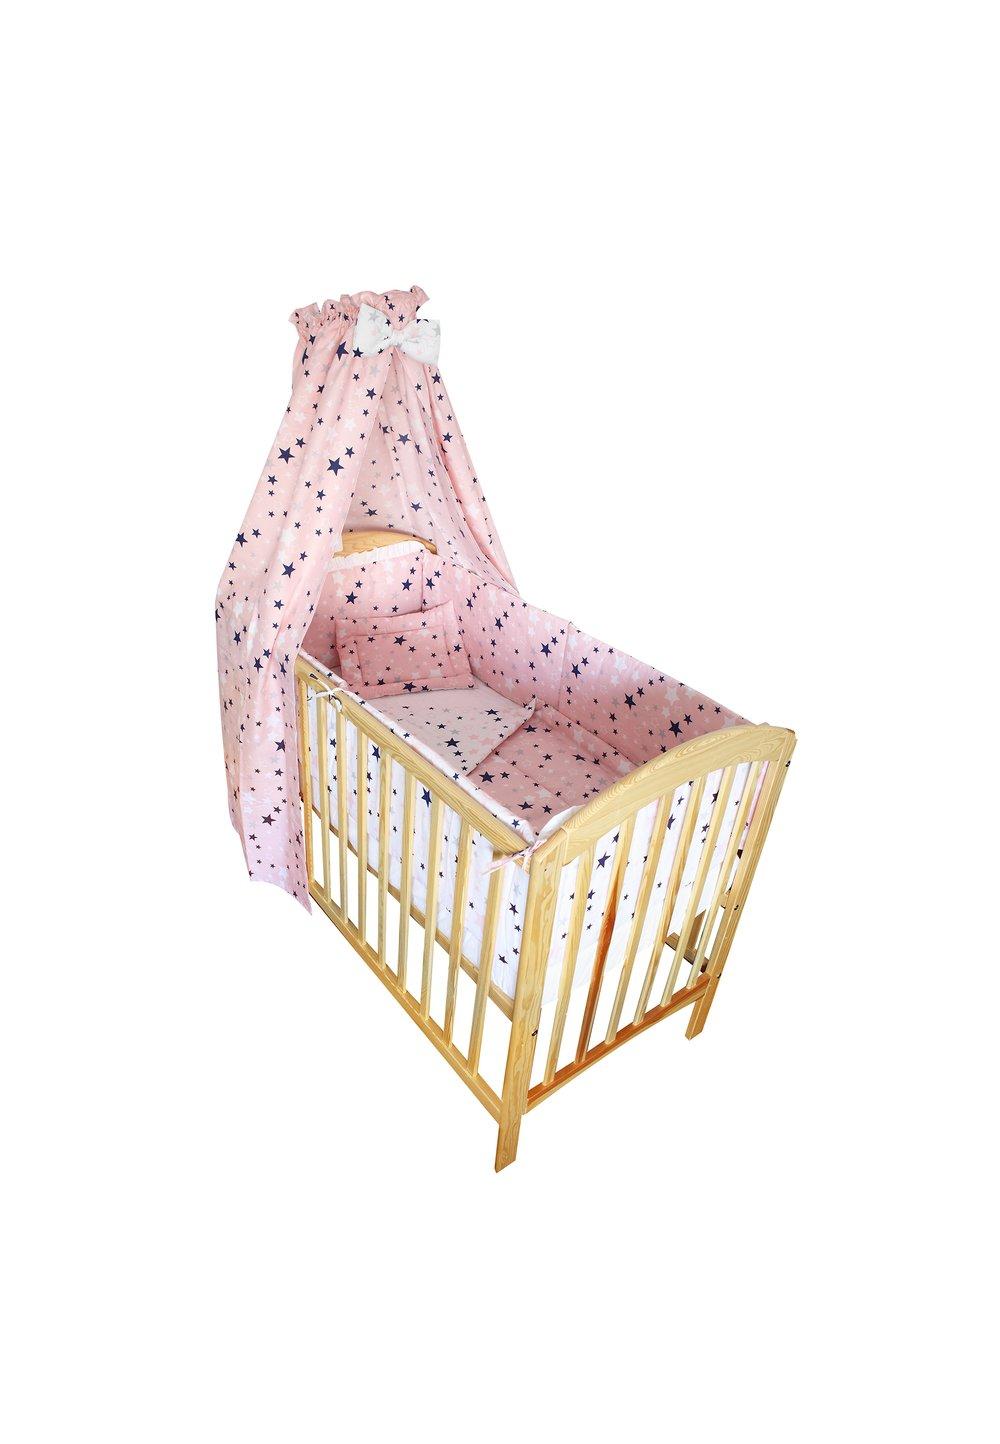 Lenjerie cu baldachin, 2 fete, stelutele roz 2, 120 x 60 cm imagine